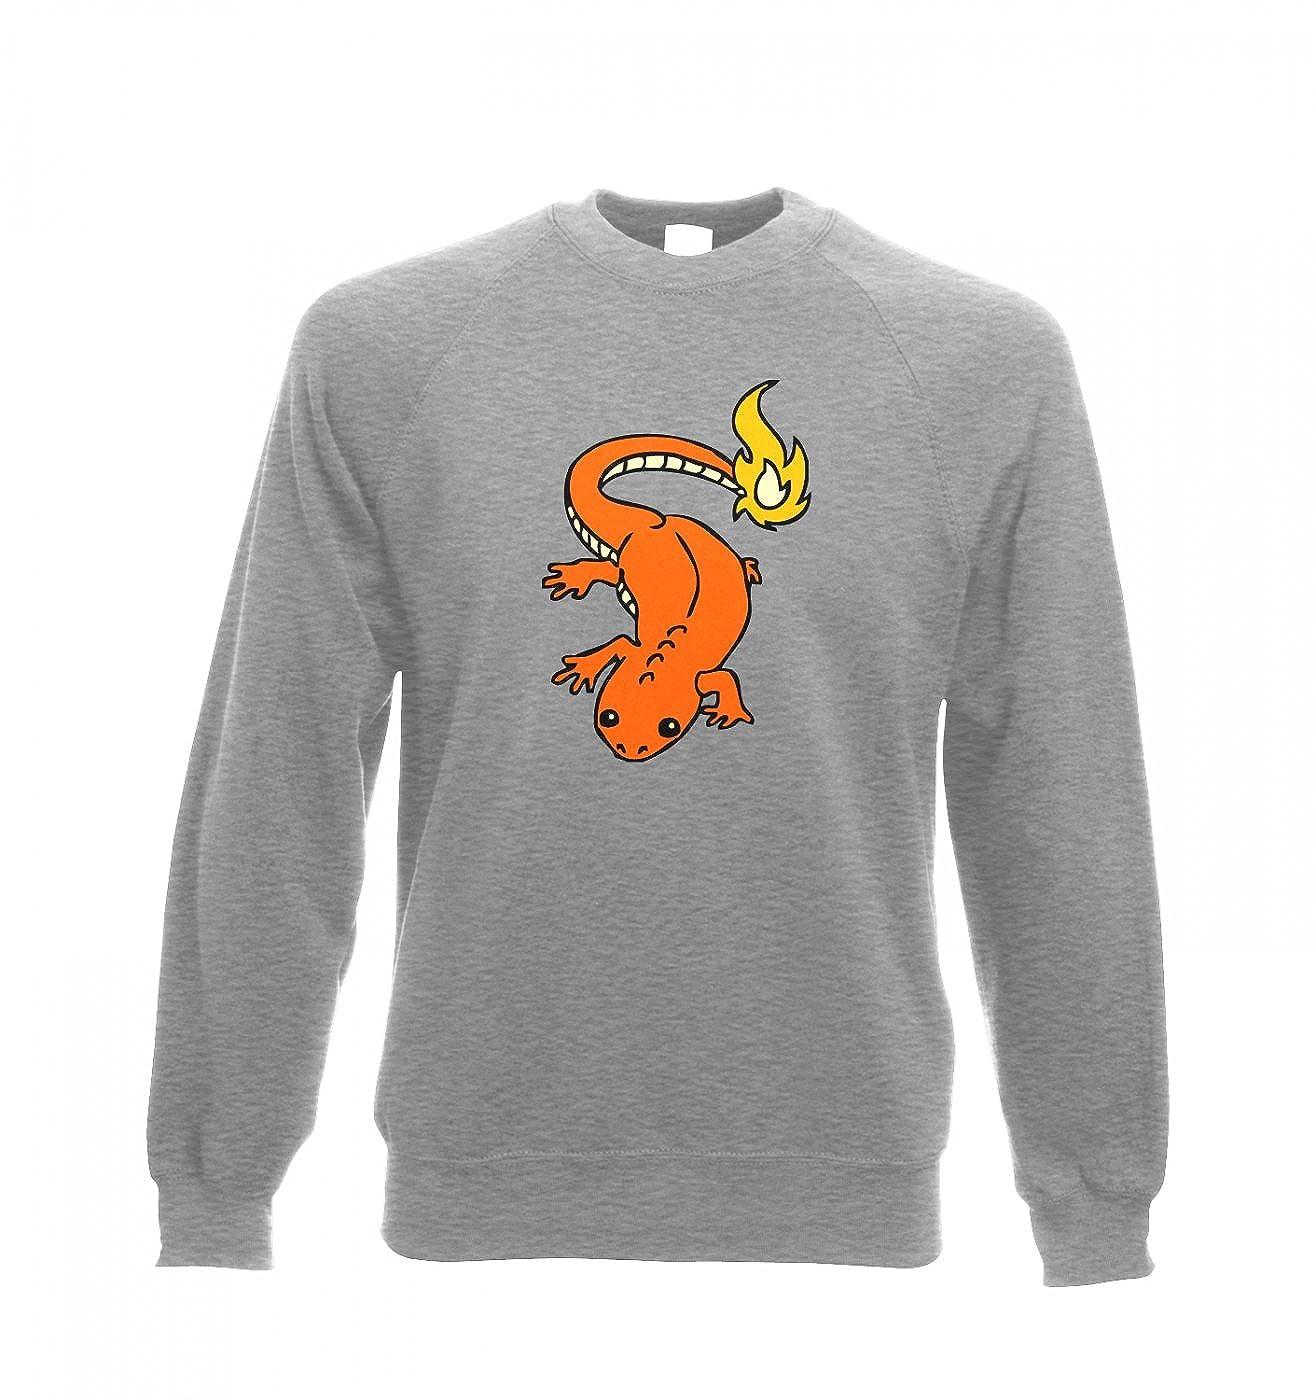 cb306d40 Real Life Charmander Adult Crewneck Sweatshirt - Inspired By Pokemon (Small  (40